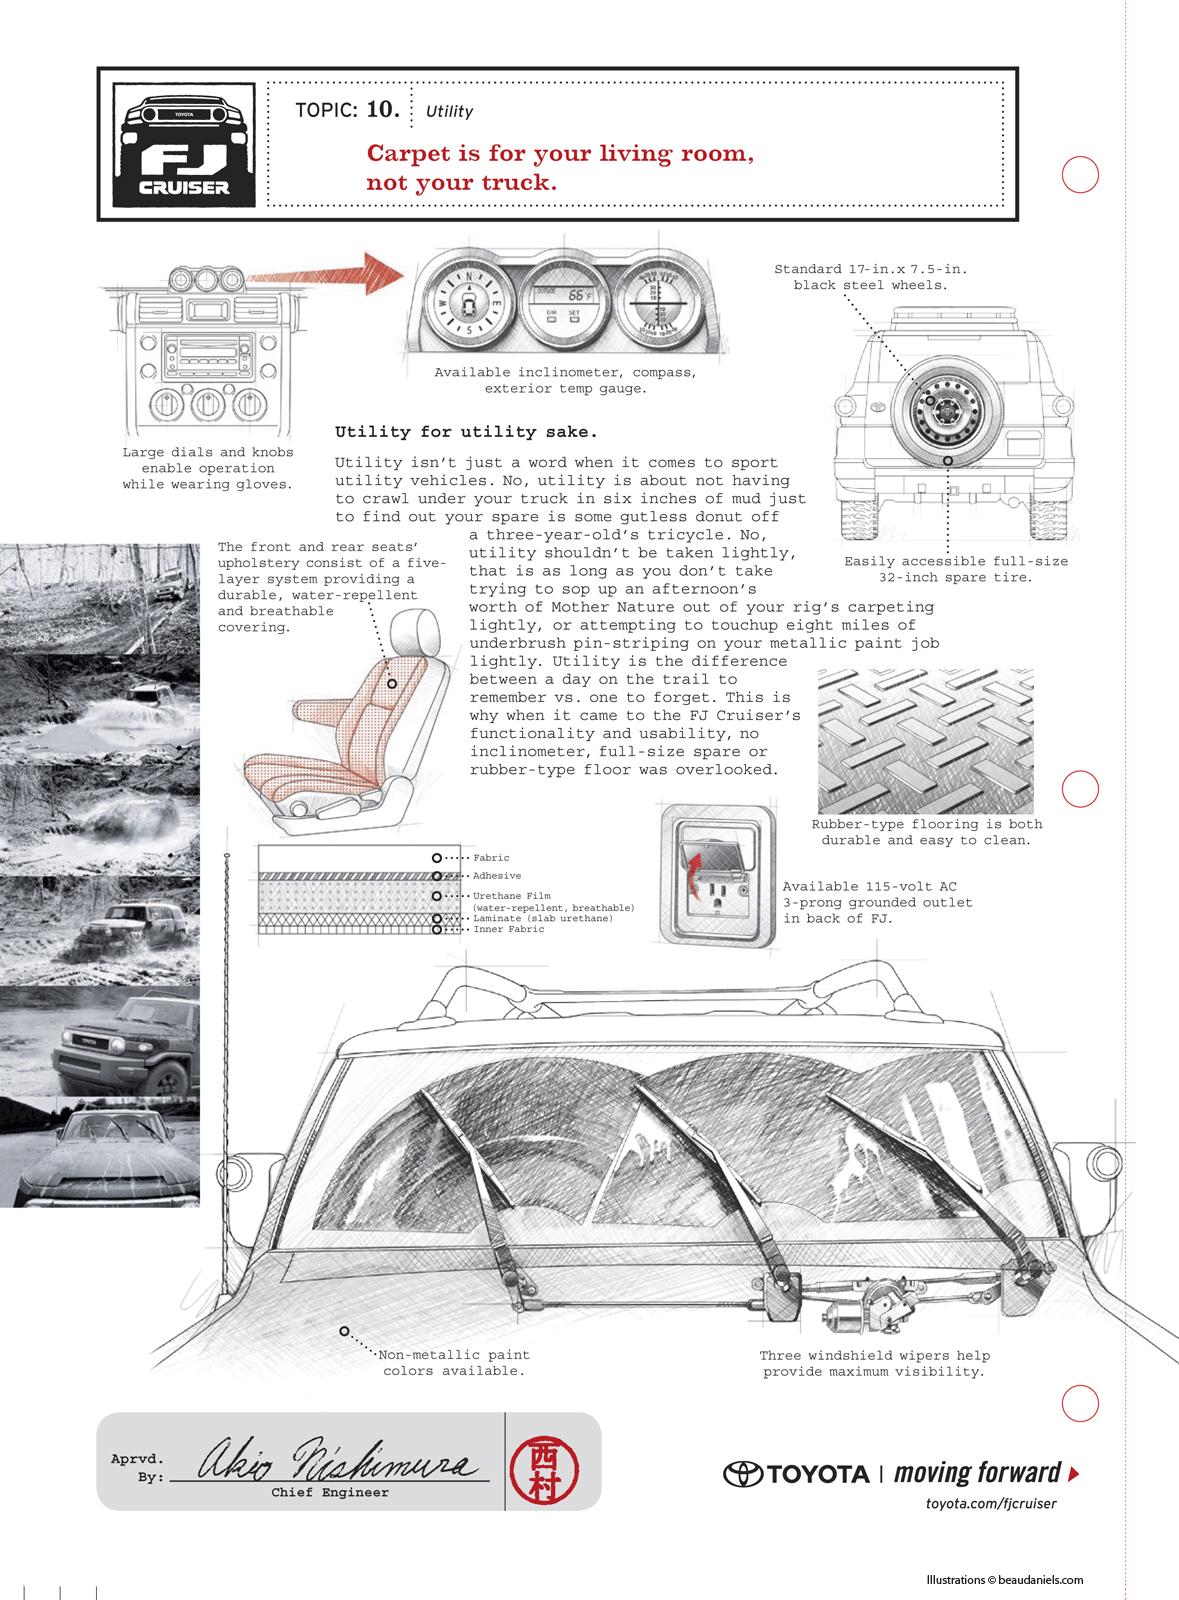 Toyota FJ Cruiser Ads on Behance